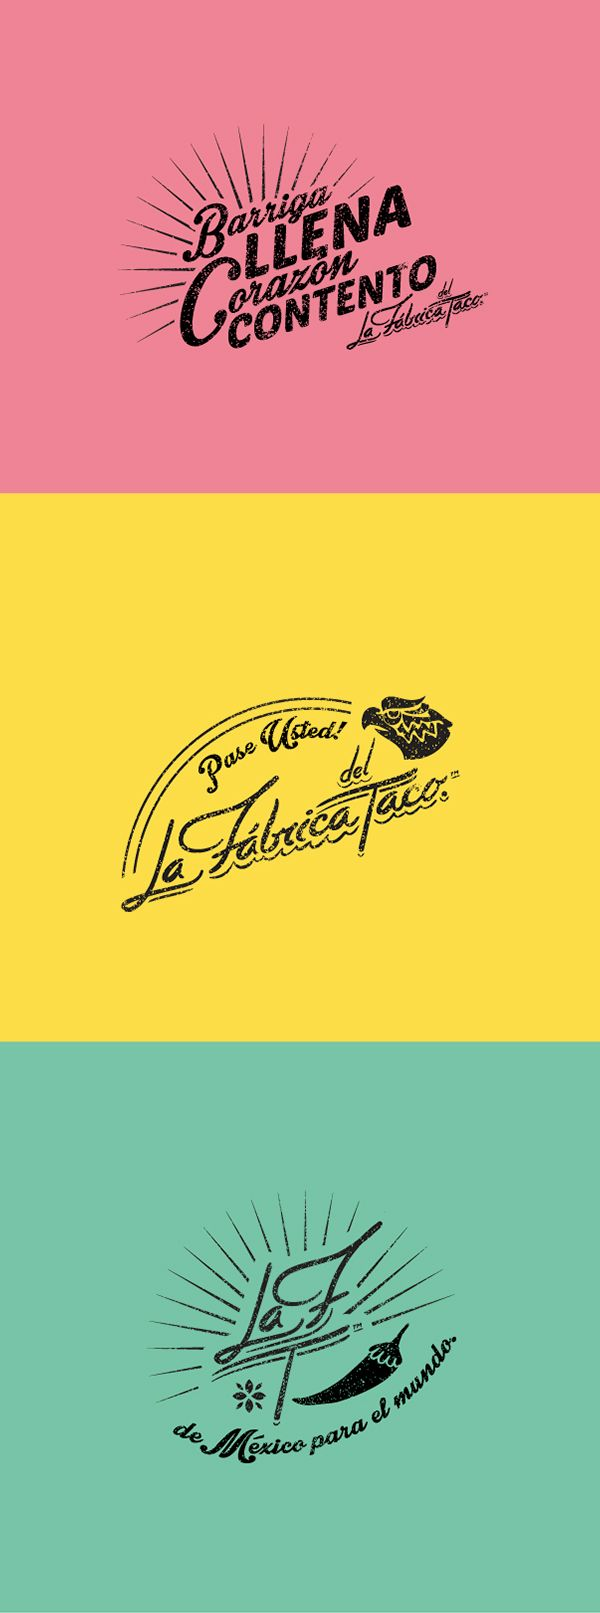 logo design for lunitas french food truck making empanadas logo la fabrica del taco on behance